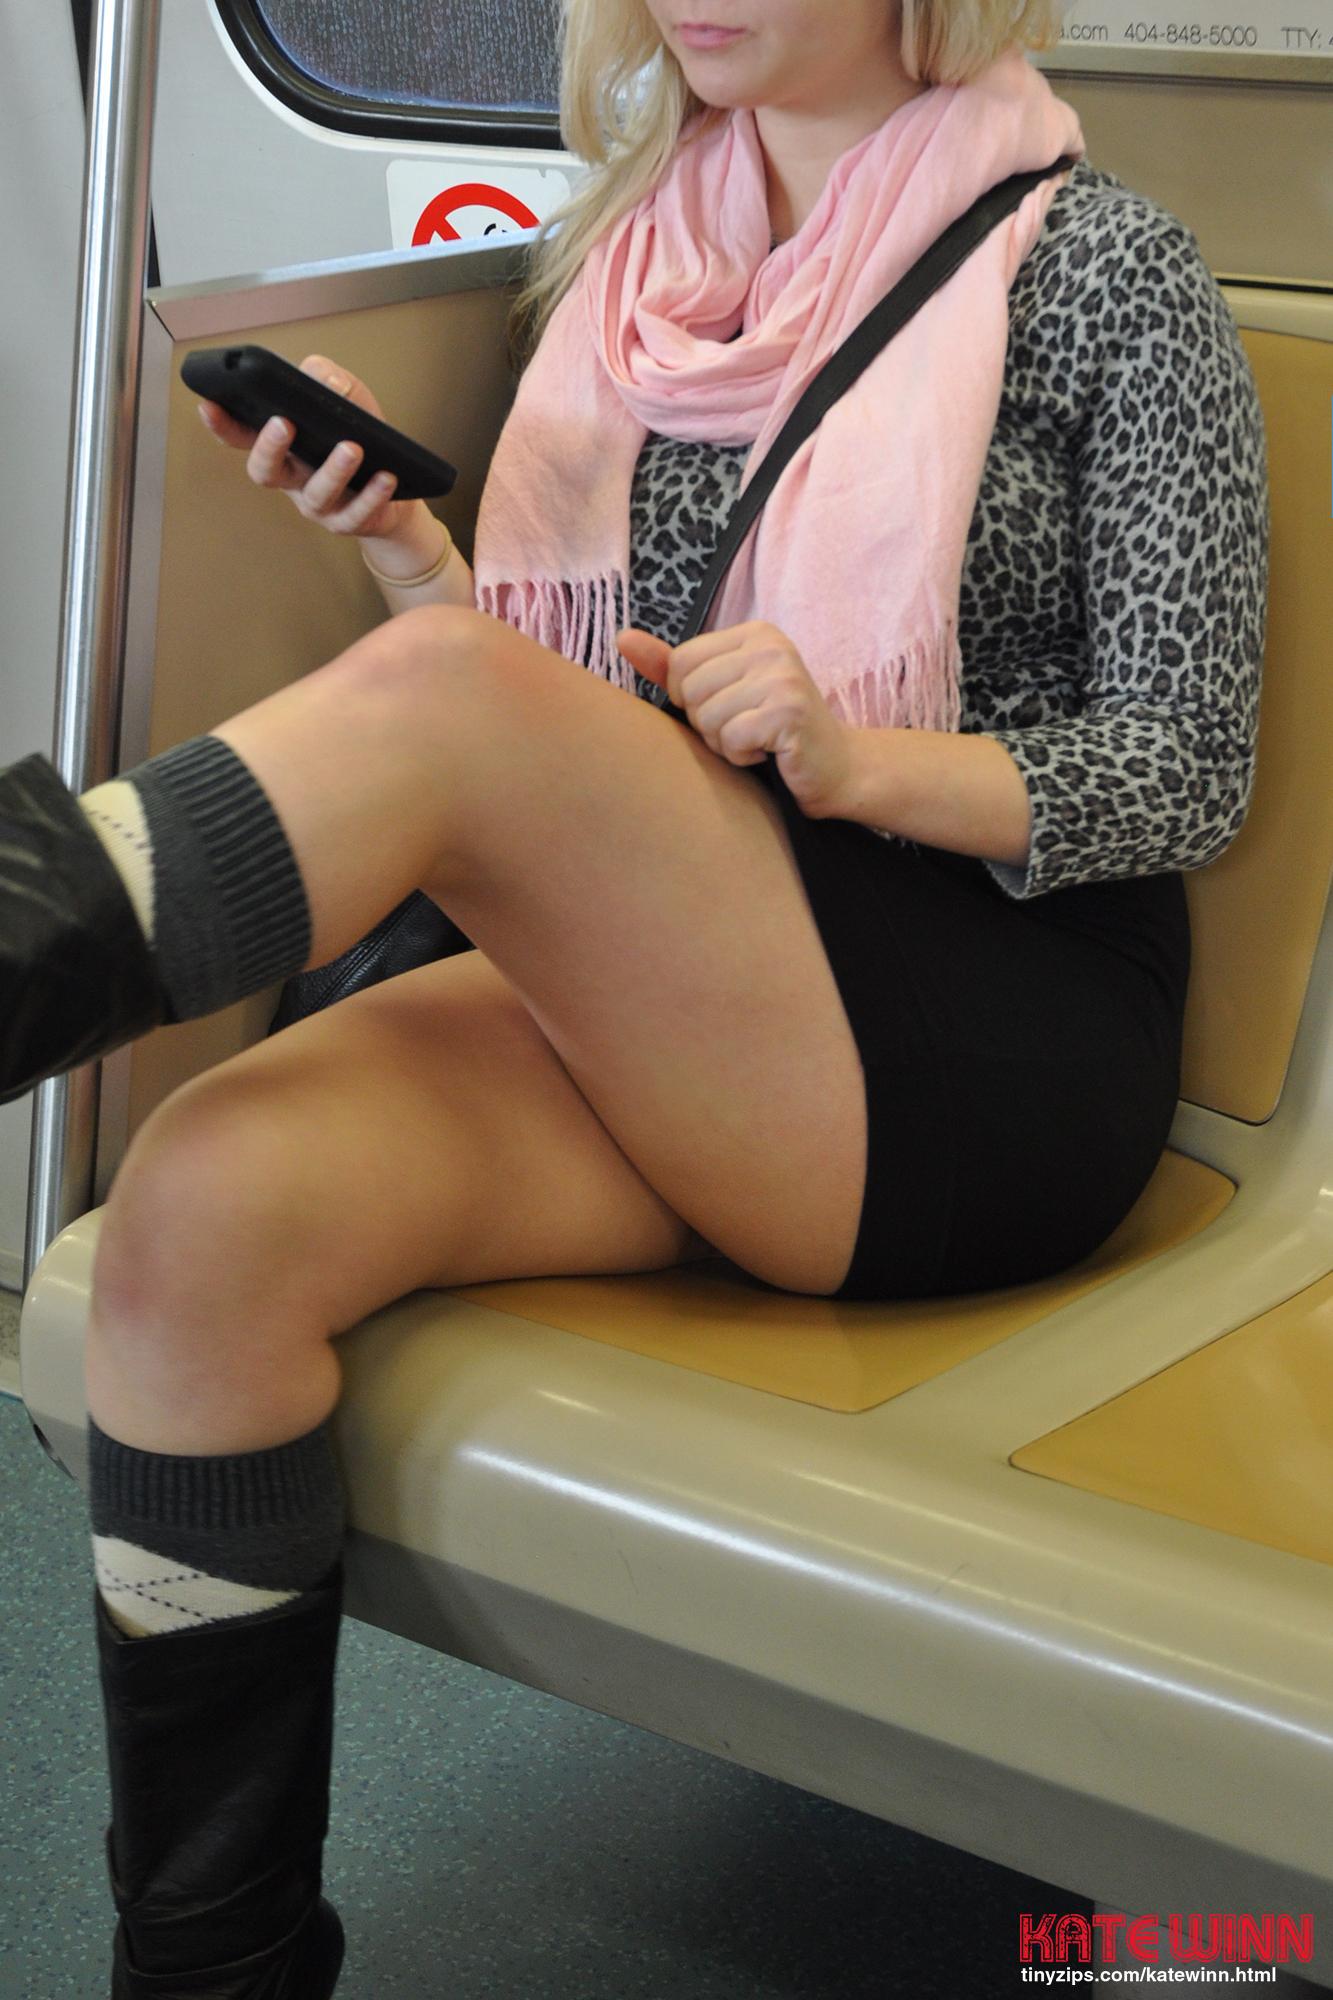 PHOTO | 1 10 - Kate Winn Public Pussy Nudes